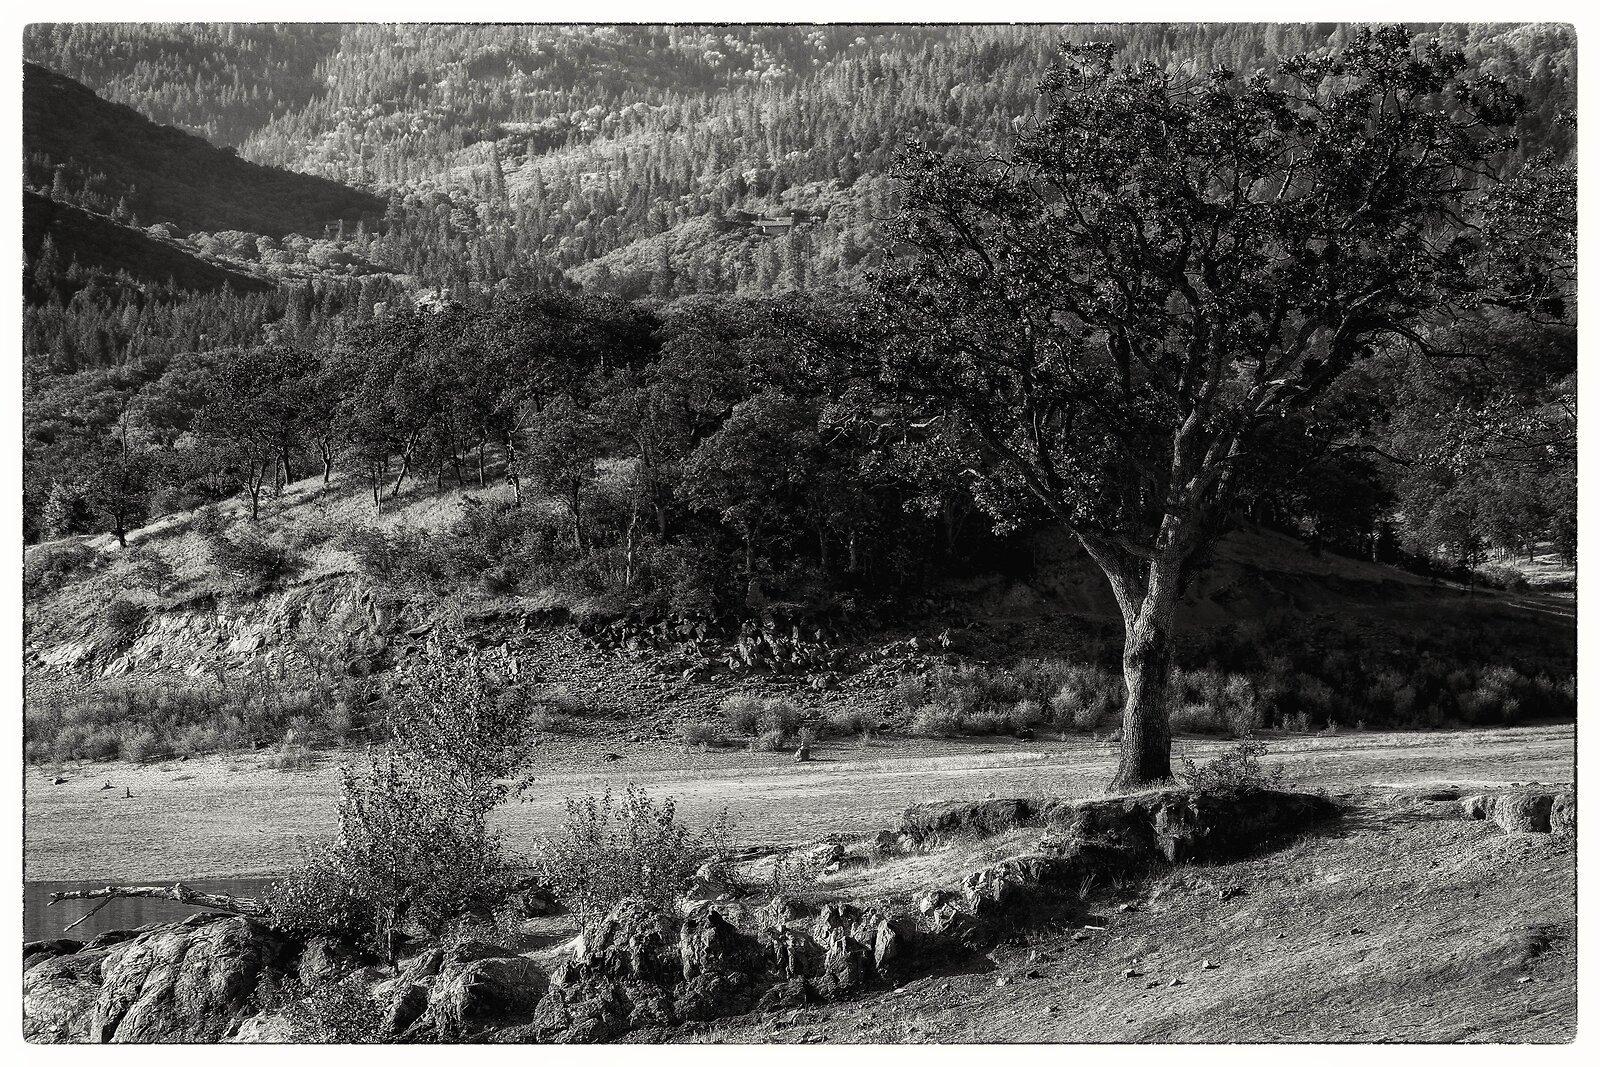 RX10_May14_21_trees_by_lake(silver.efex).jpg